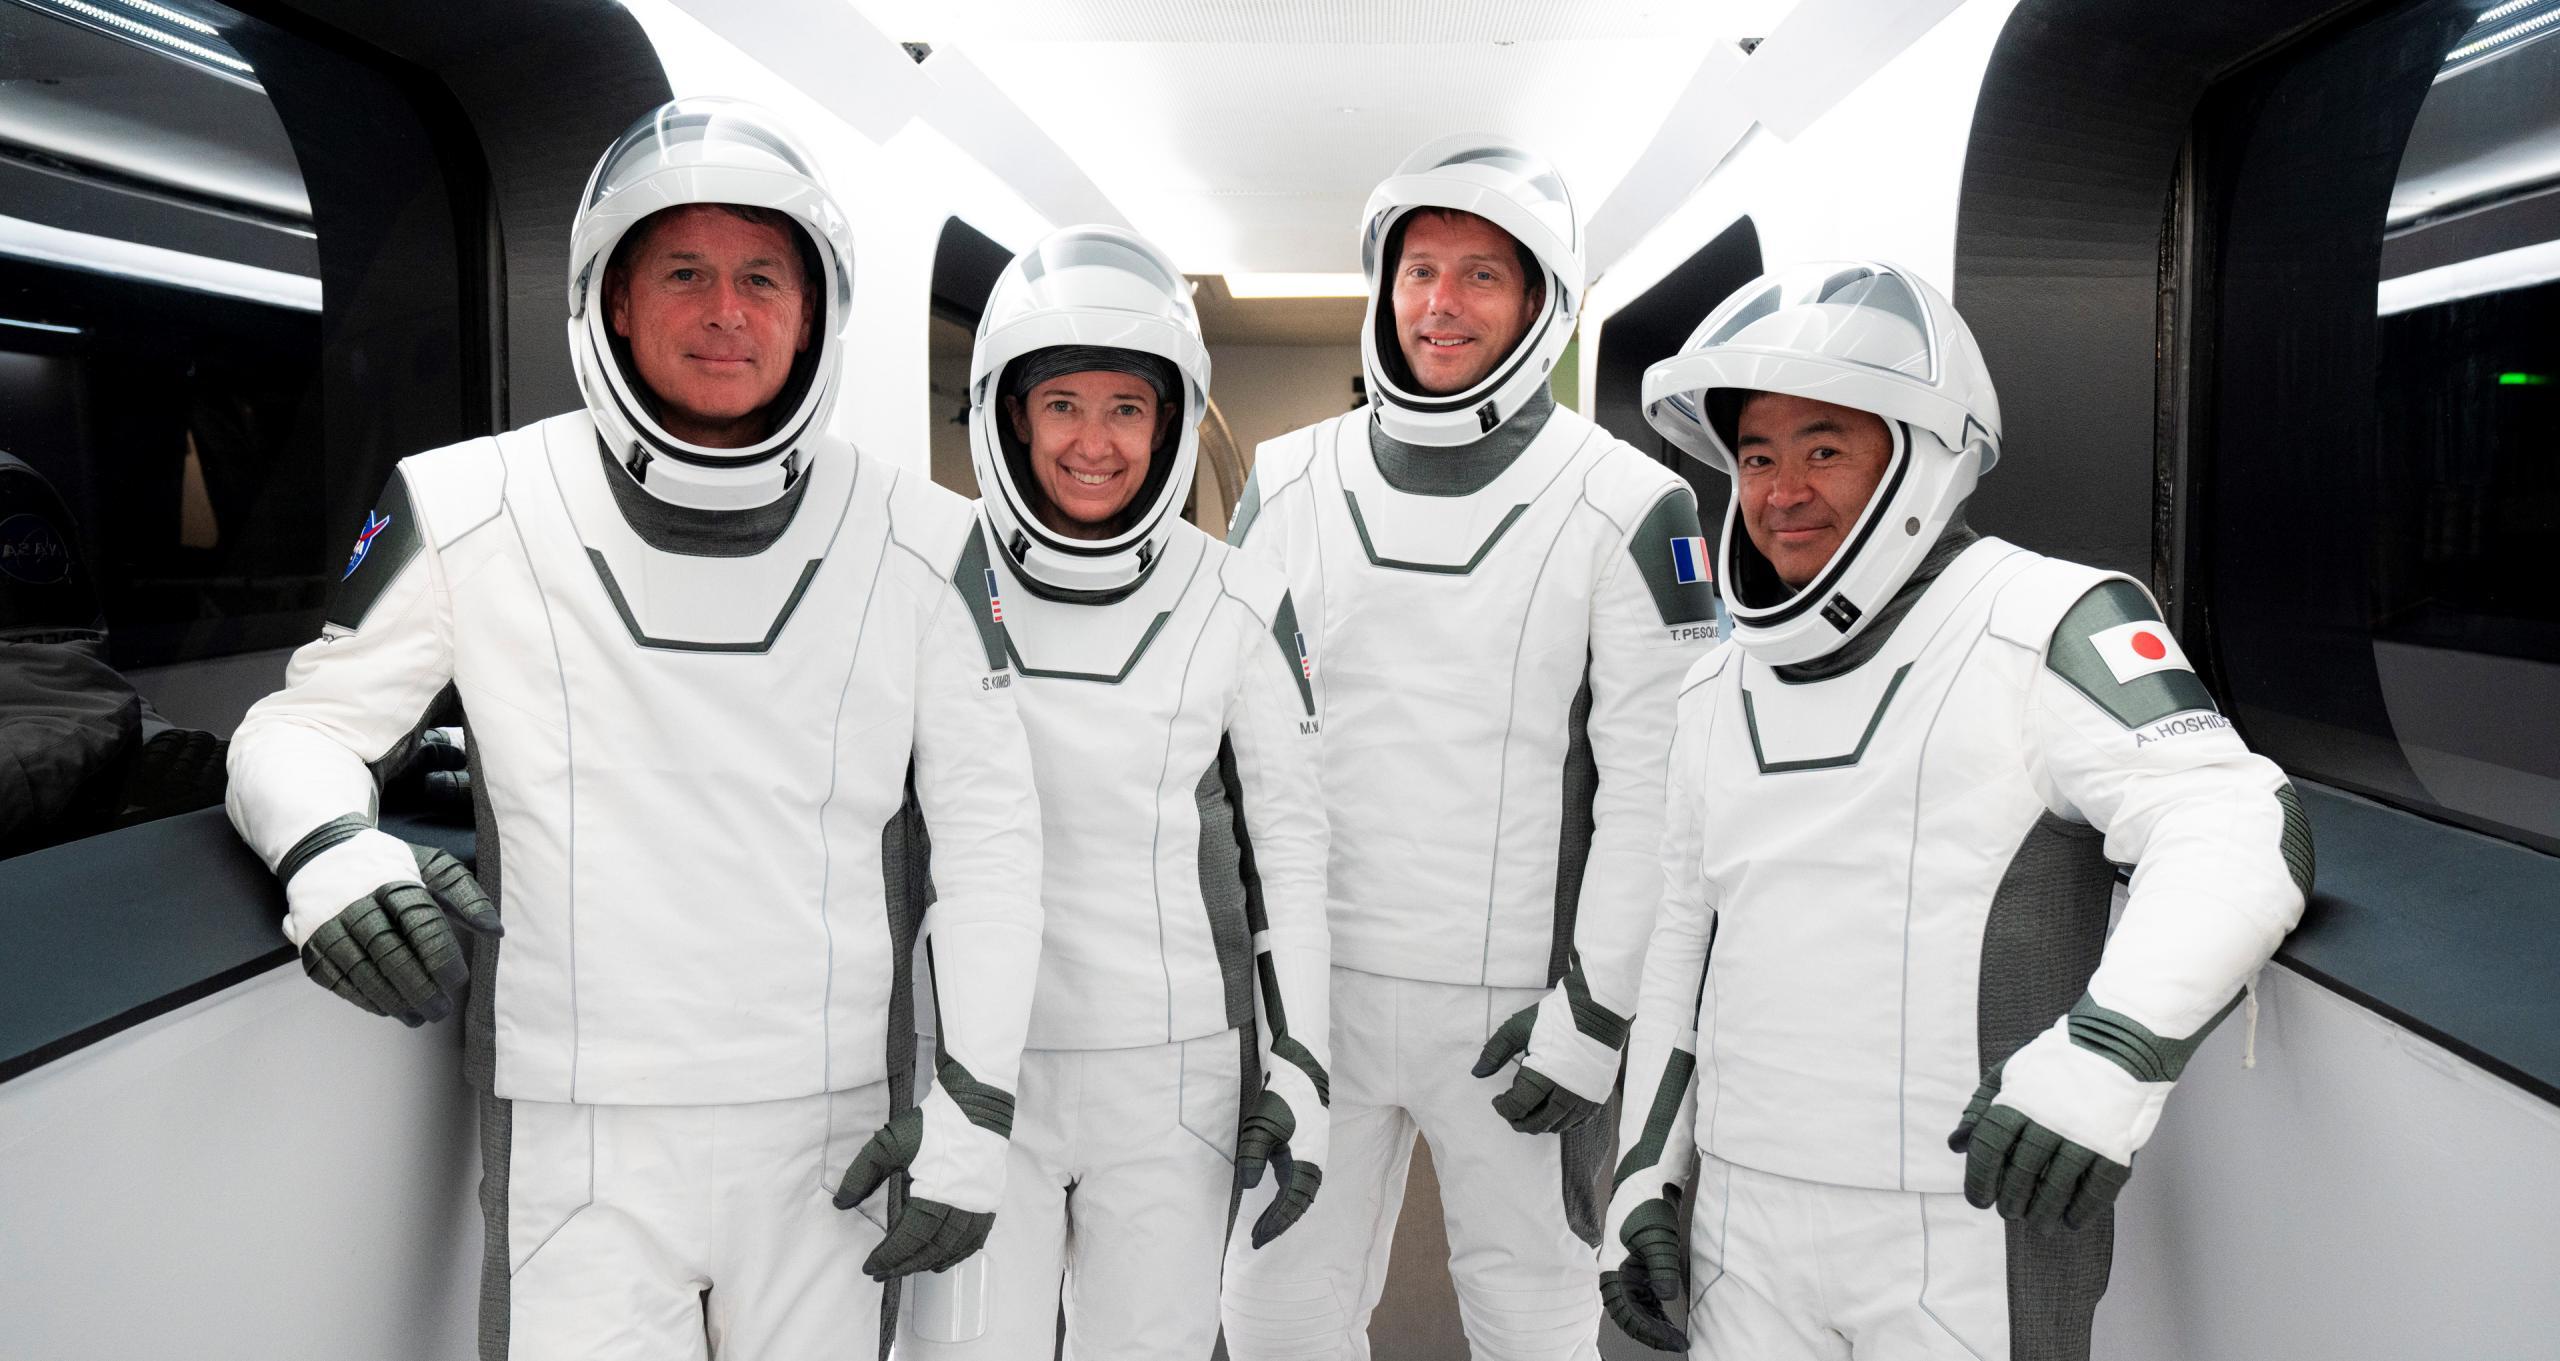 Crew-2 Crew Dragon C206 Falcon 9 B1061 39A 041821 (SpaceX) dry dress CAA 1 crop (c)